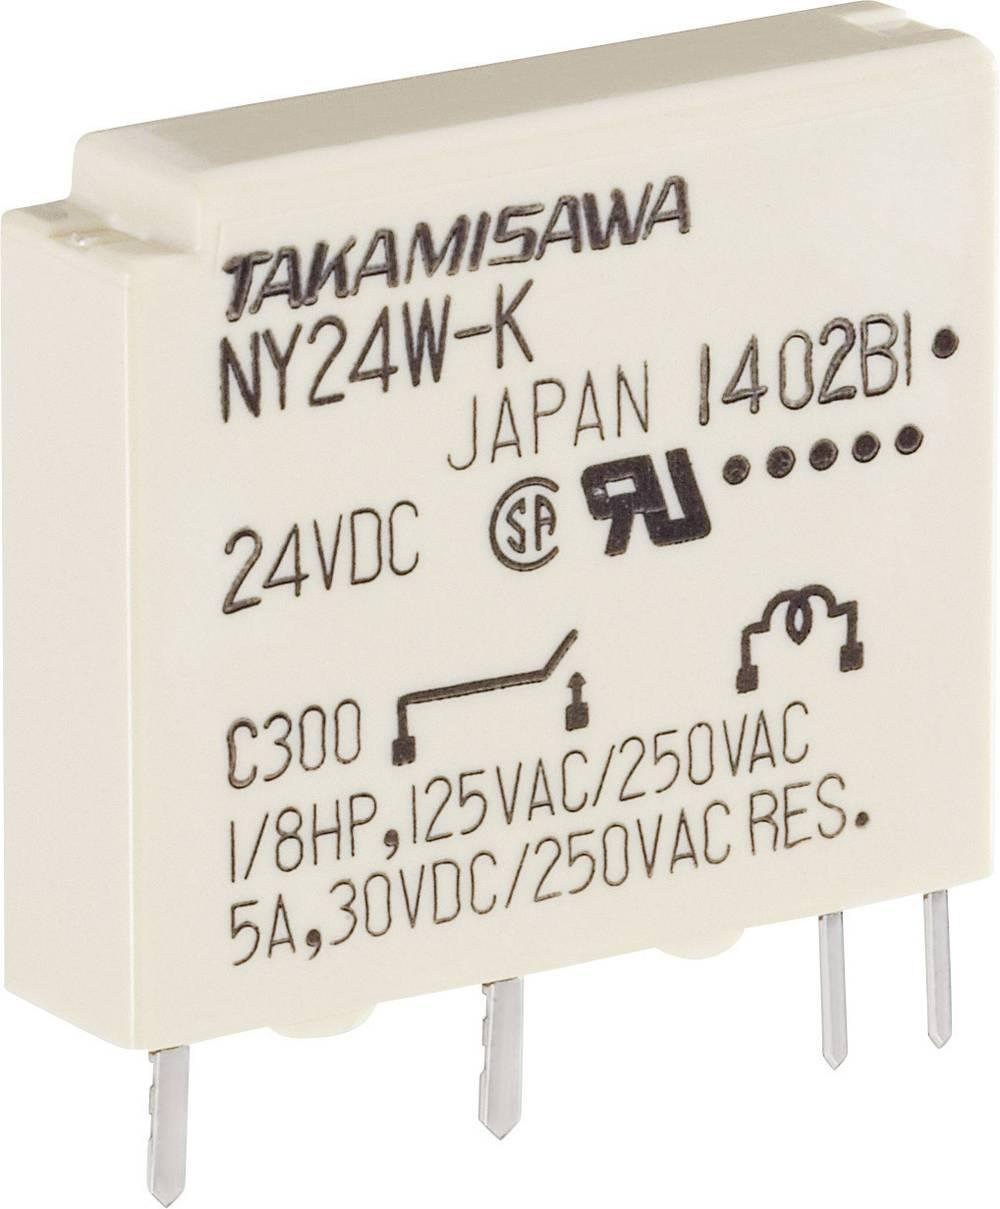 Printrelæ 5 V/DC 5 A 1 x sluttekontakt Takamisawa NY-05W-K-IE 1 stk